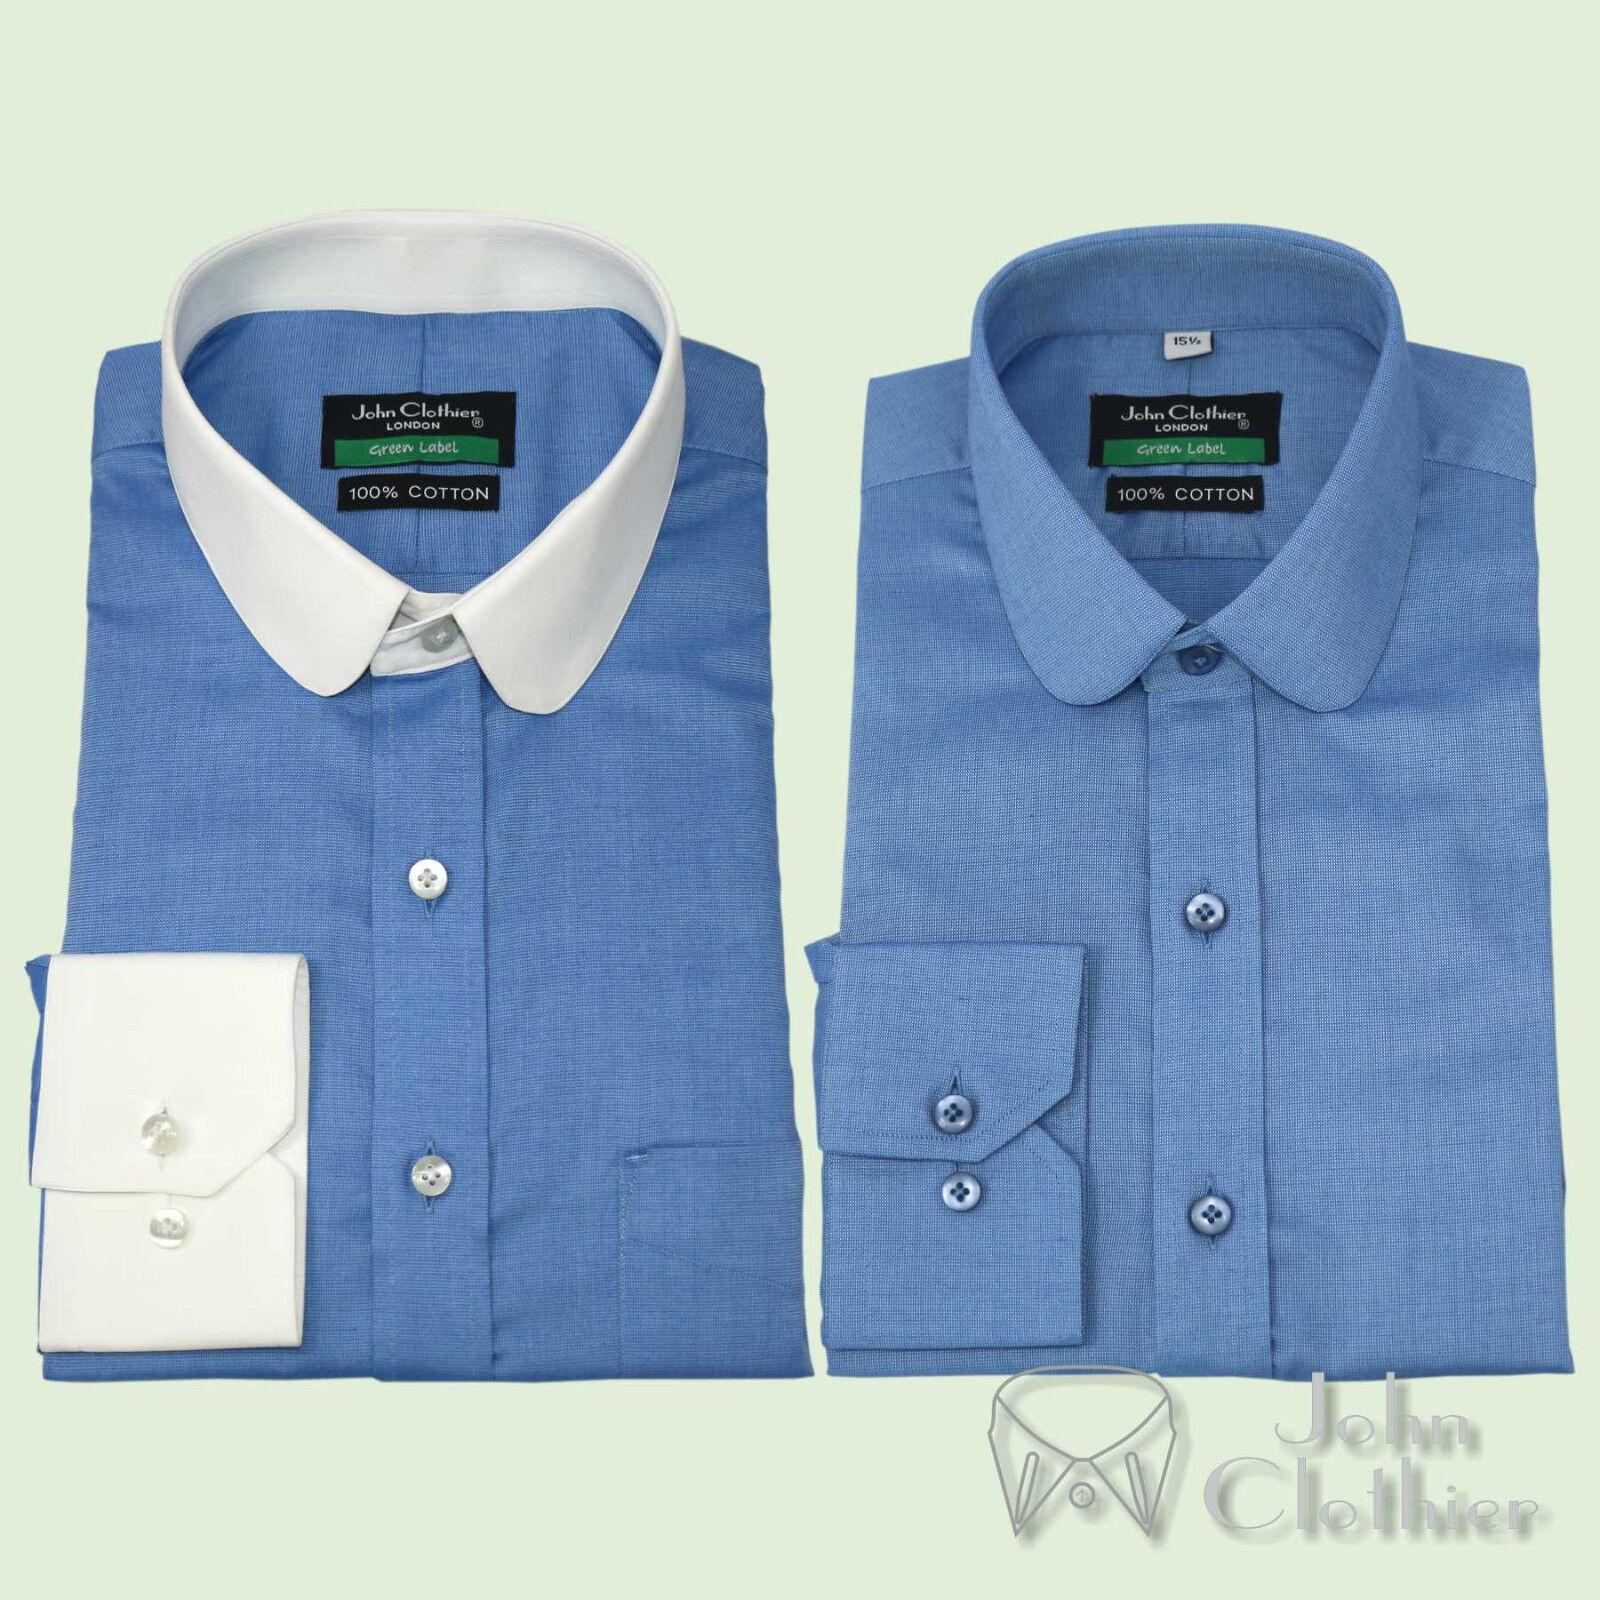 herren baumwolle Penny halsband hemd Blau tiny checks Club halsband Gents Classic hemd